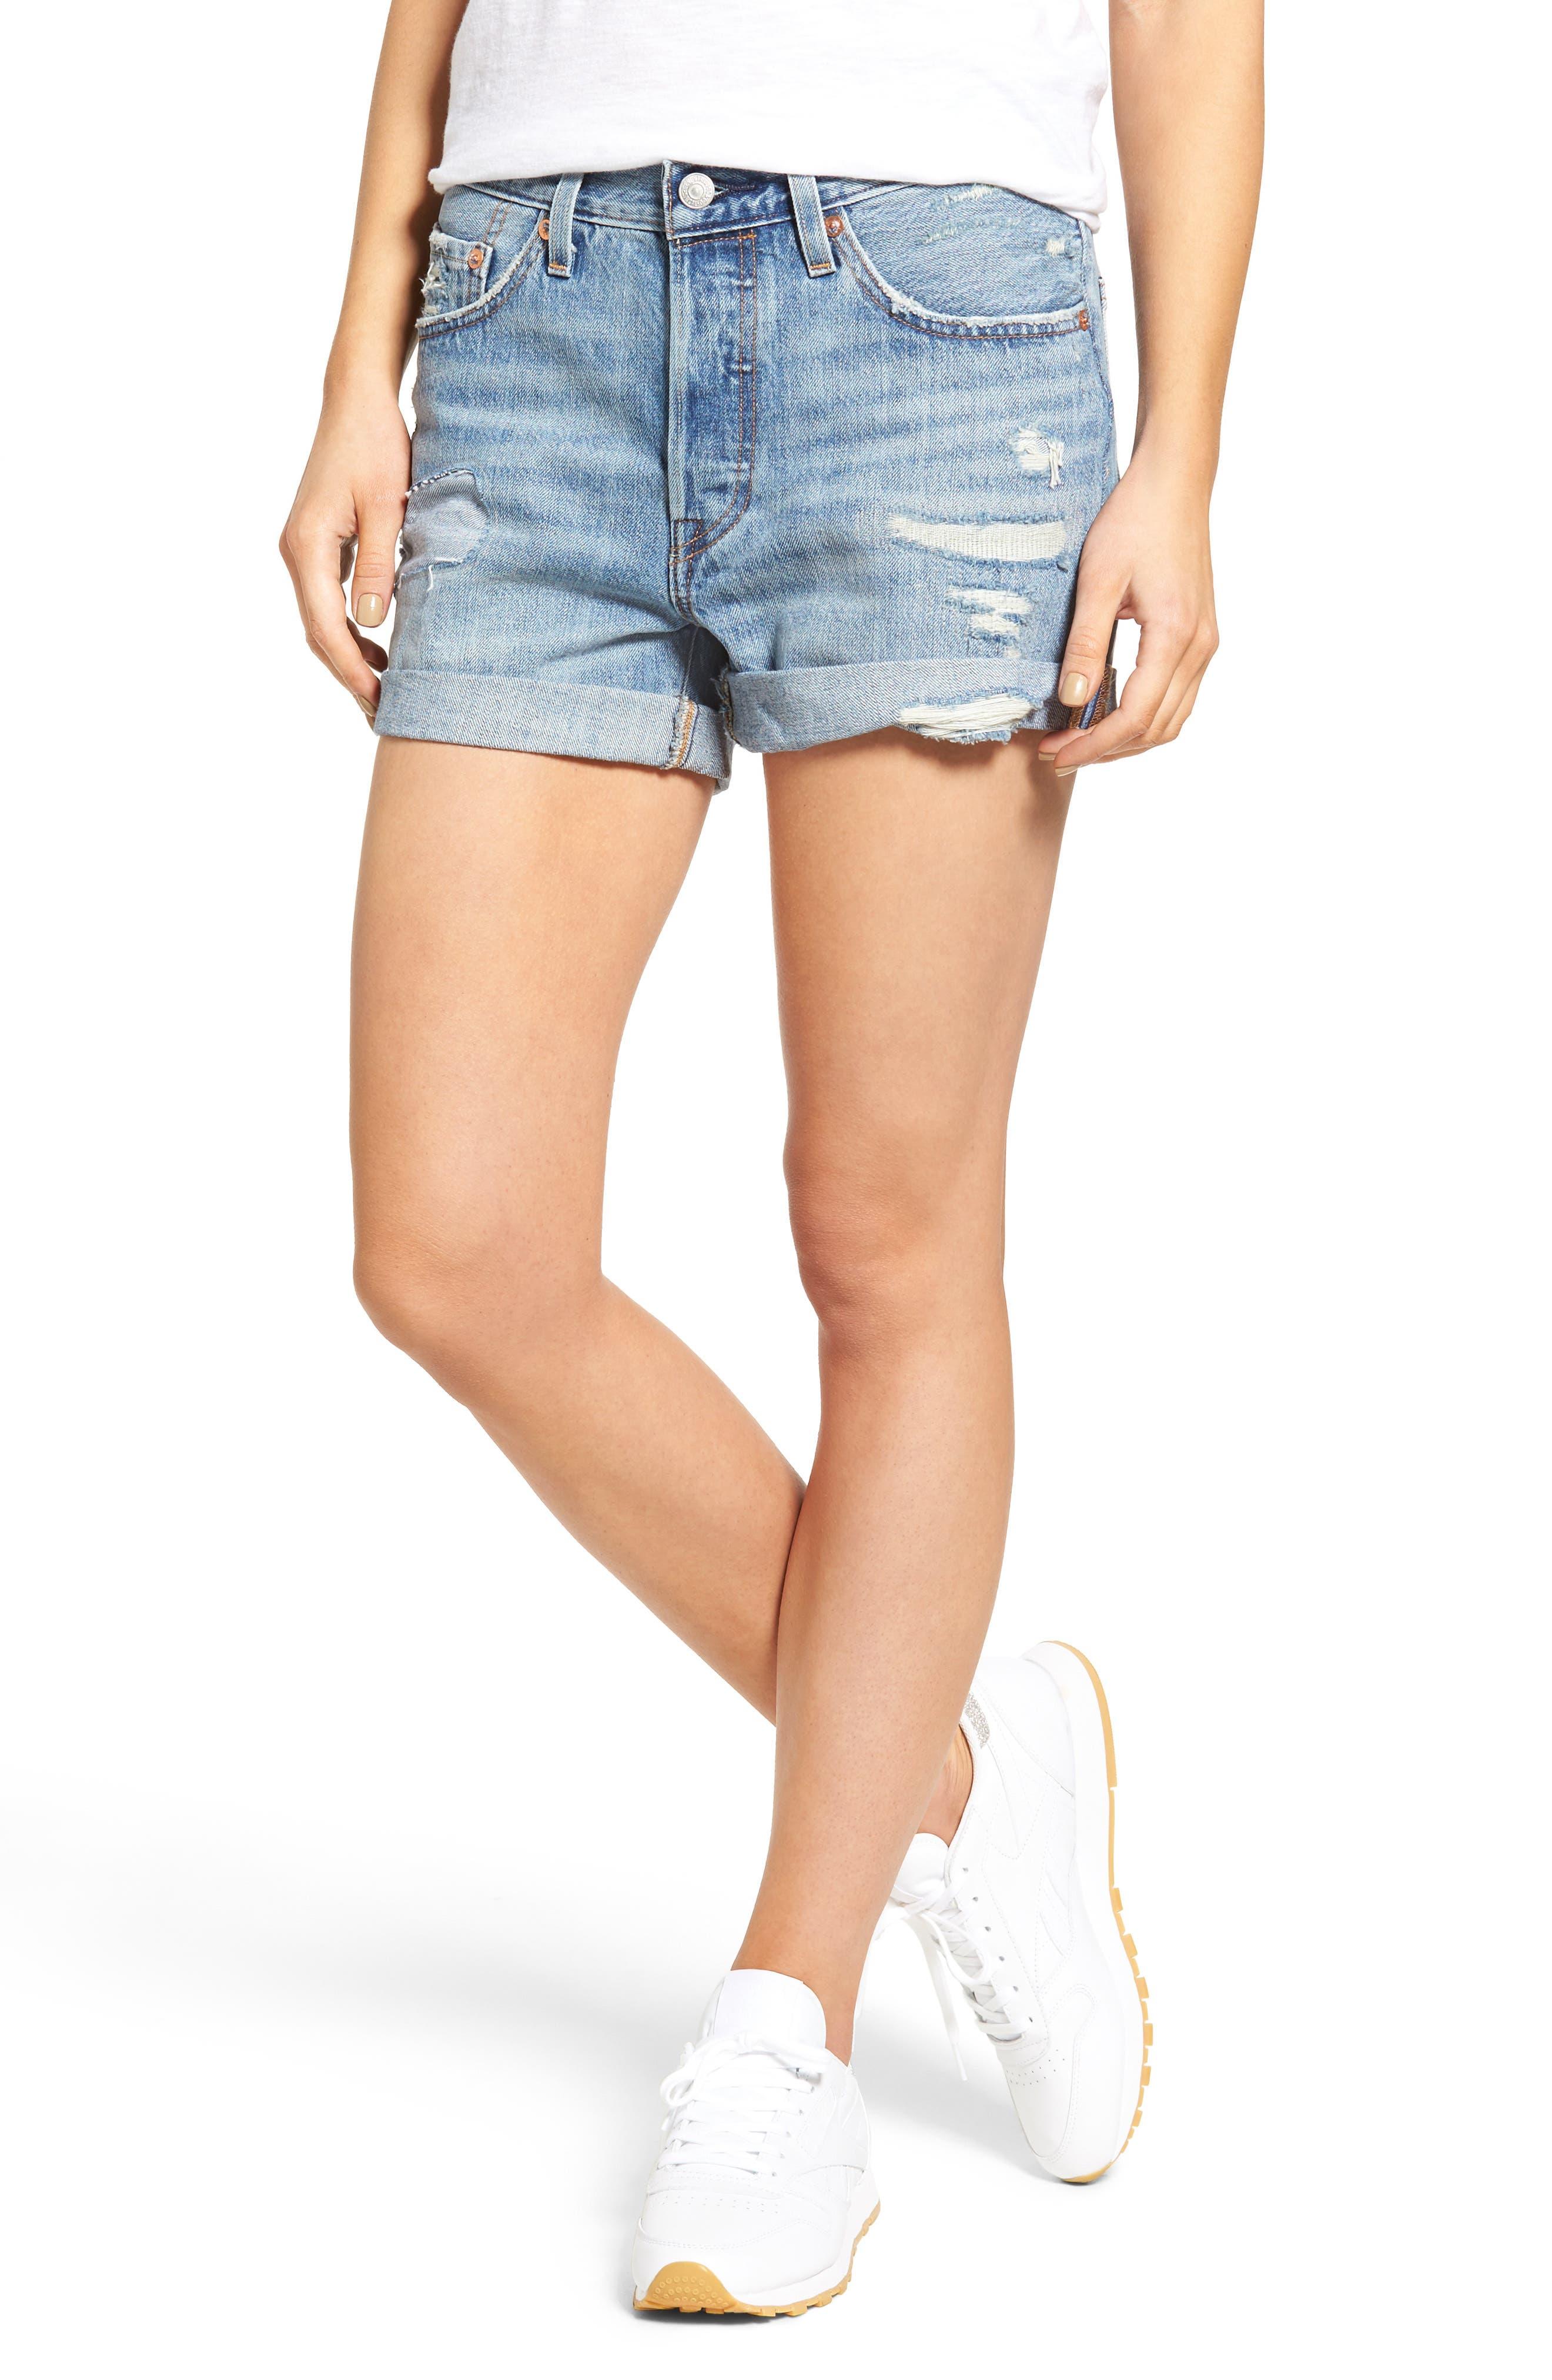 Alternate Image 1 Selected - Levi's® 501 Long Denim Shorts